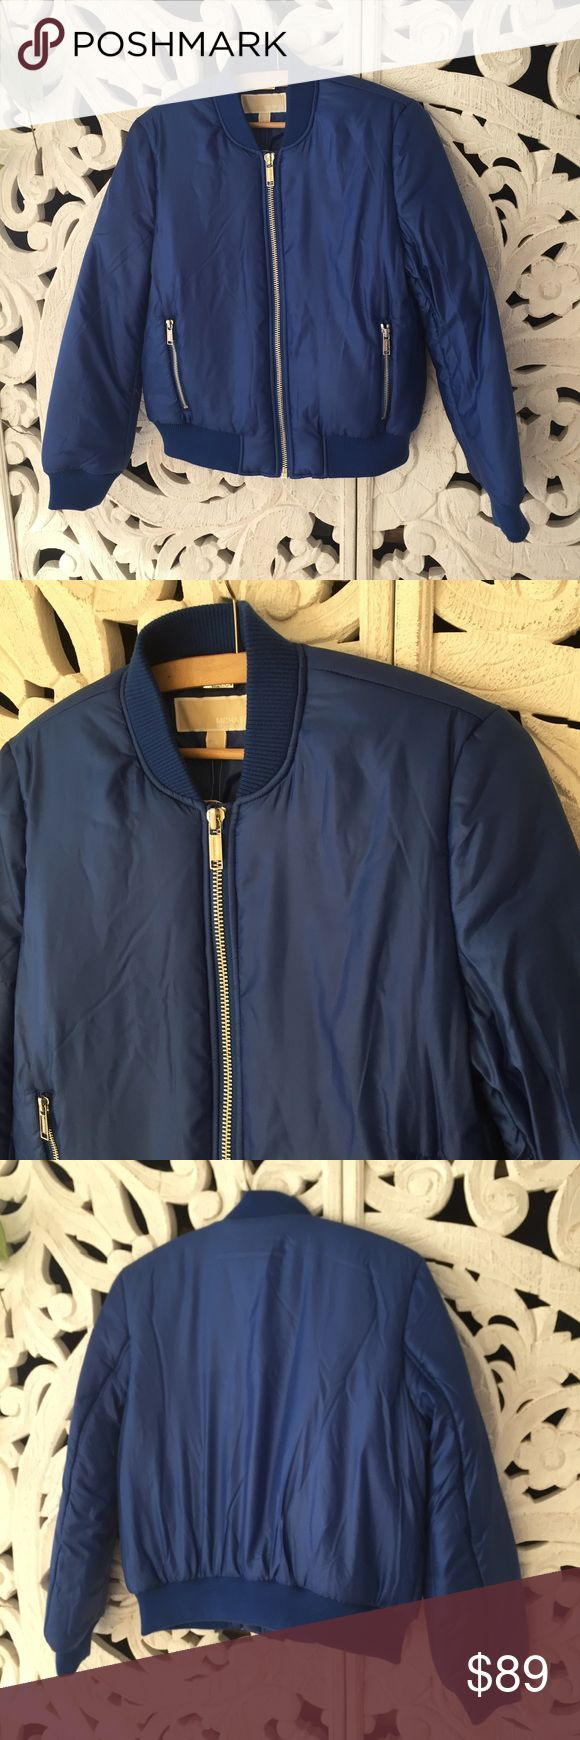 Michael Kors Royal Blue Puffer Jacket Michael Kors Royal Blue Puffer Jacket. Brand new with tags Michael Kors Jackets & Coats Puffers